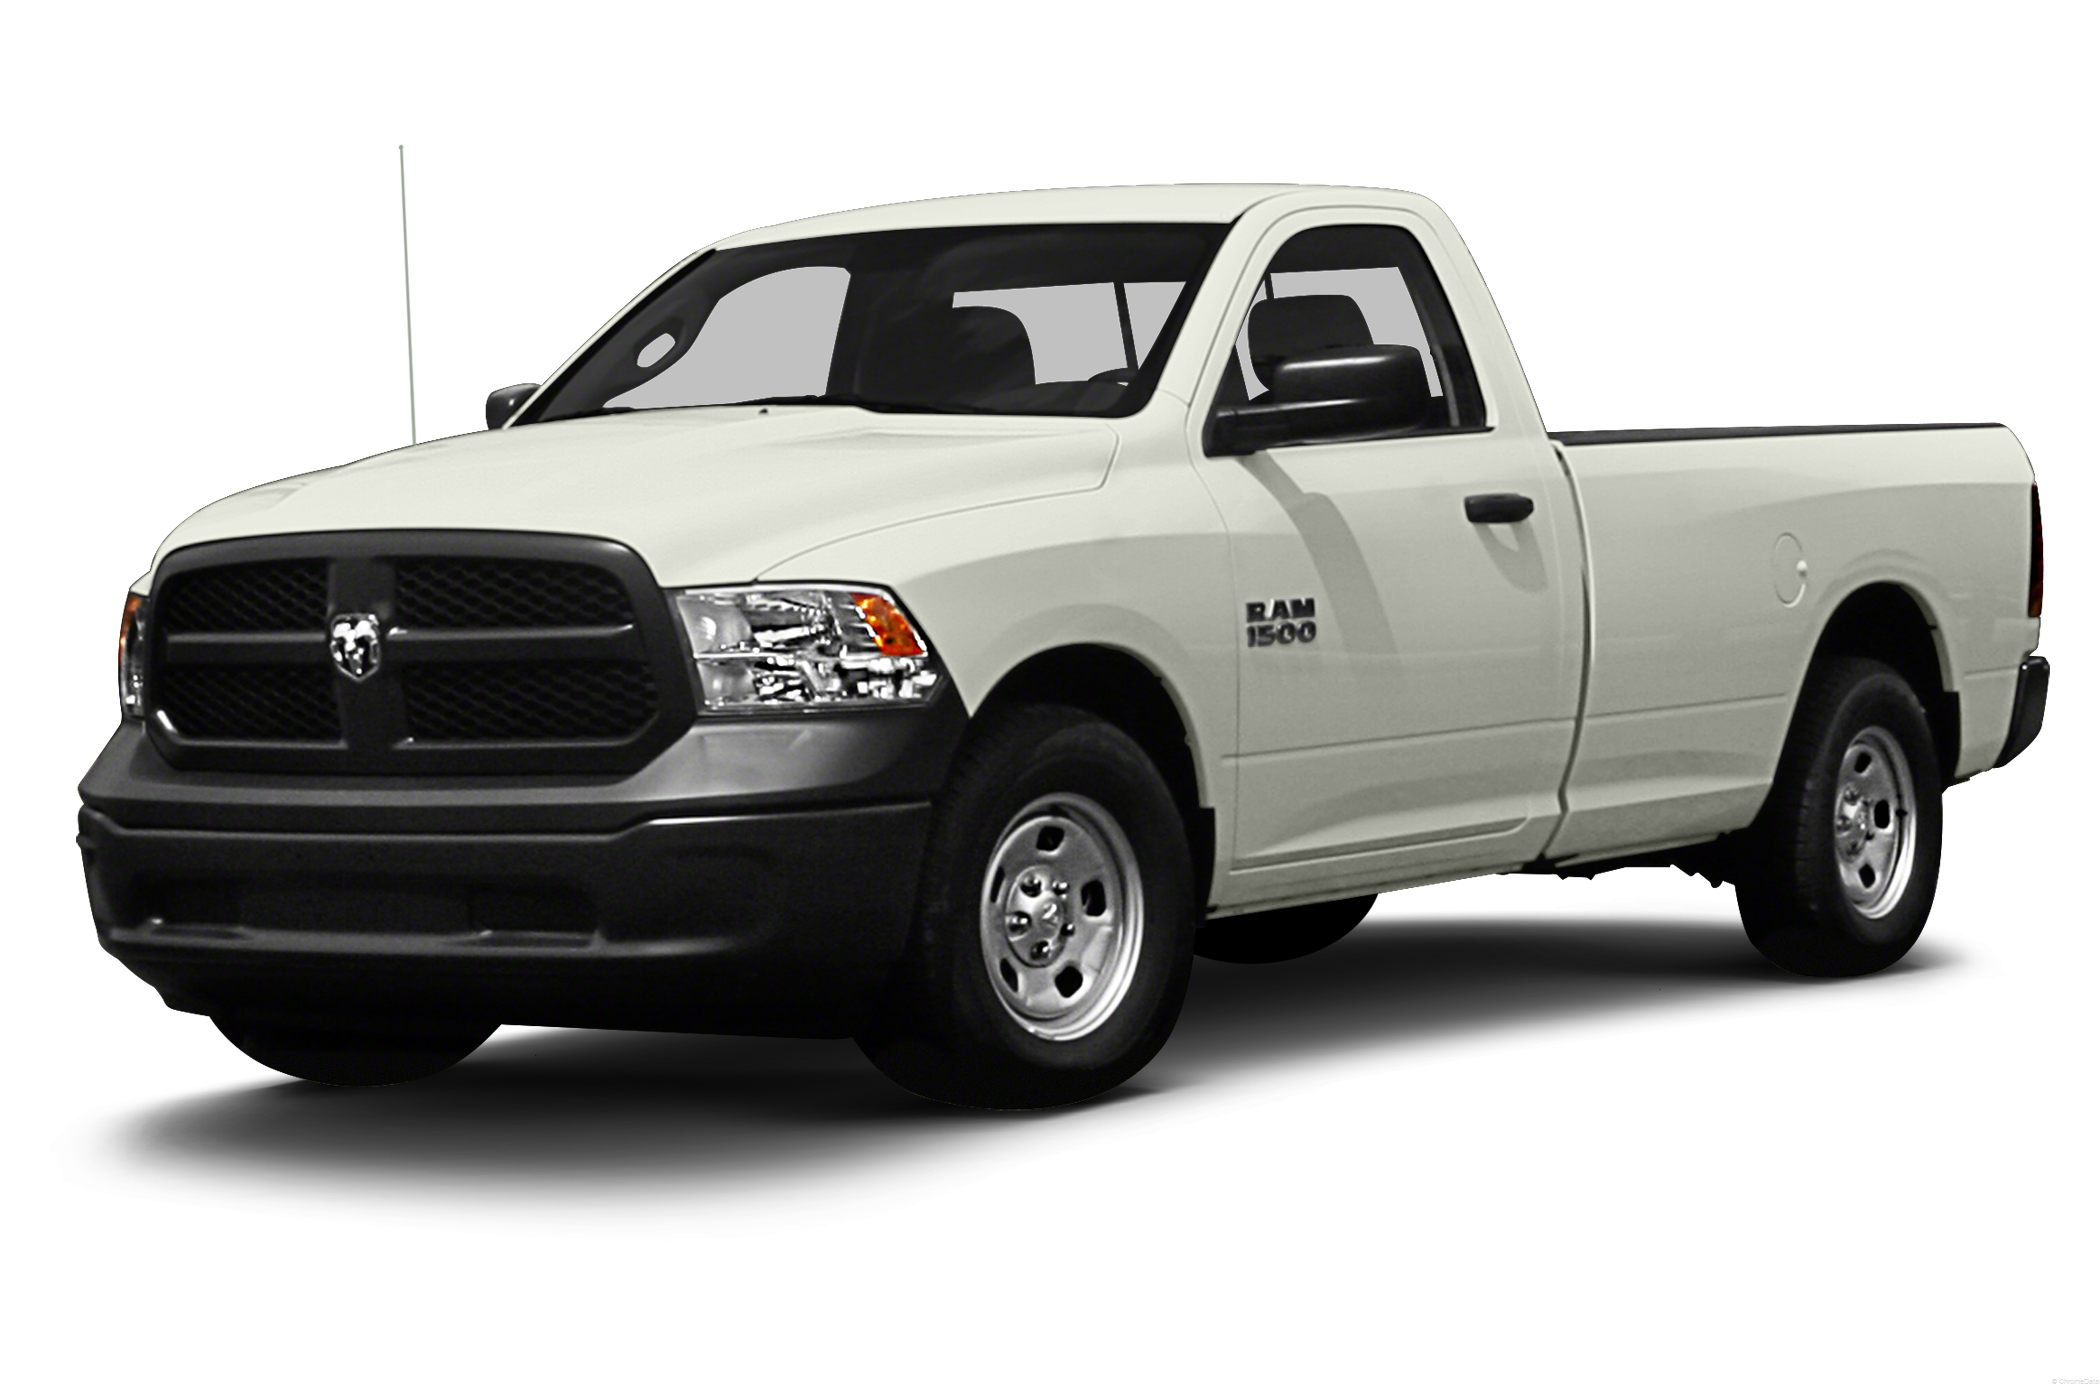 ram trucks 1500 regular cab specs 2013 2014 2015 autoevolution. Black Bedroom Furniture Sets. Home Design Ideas